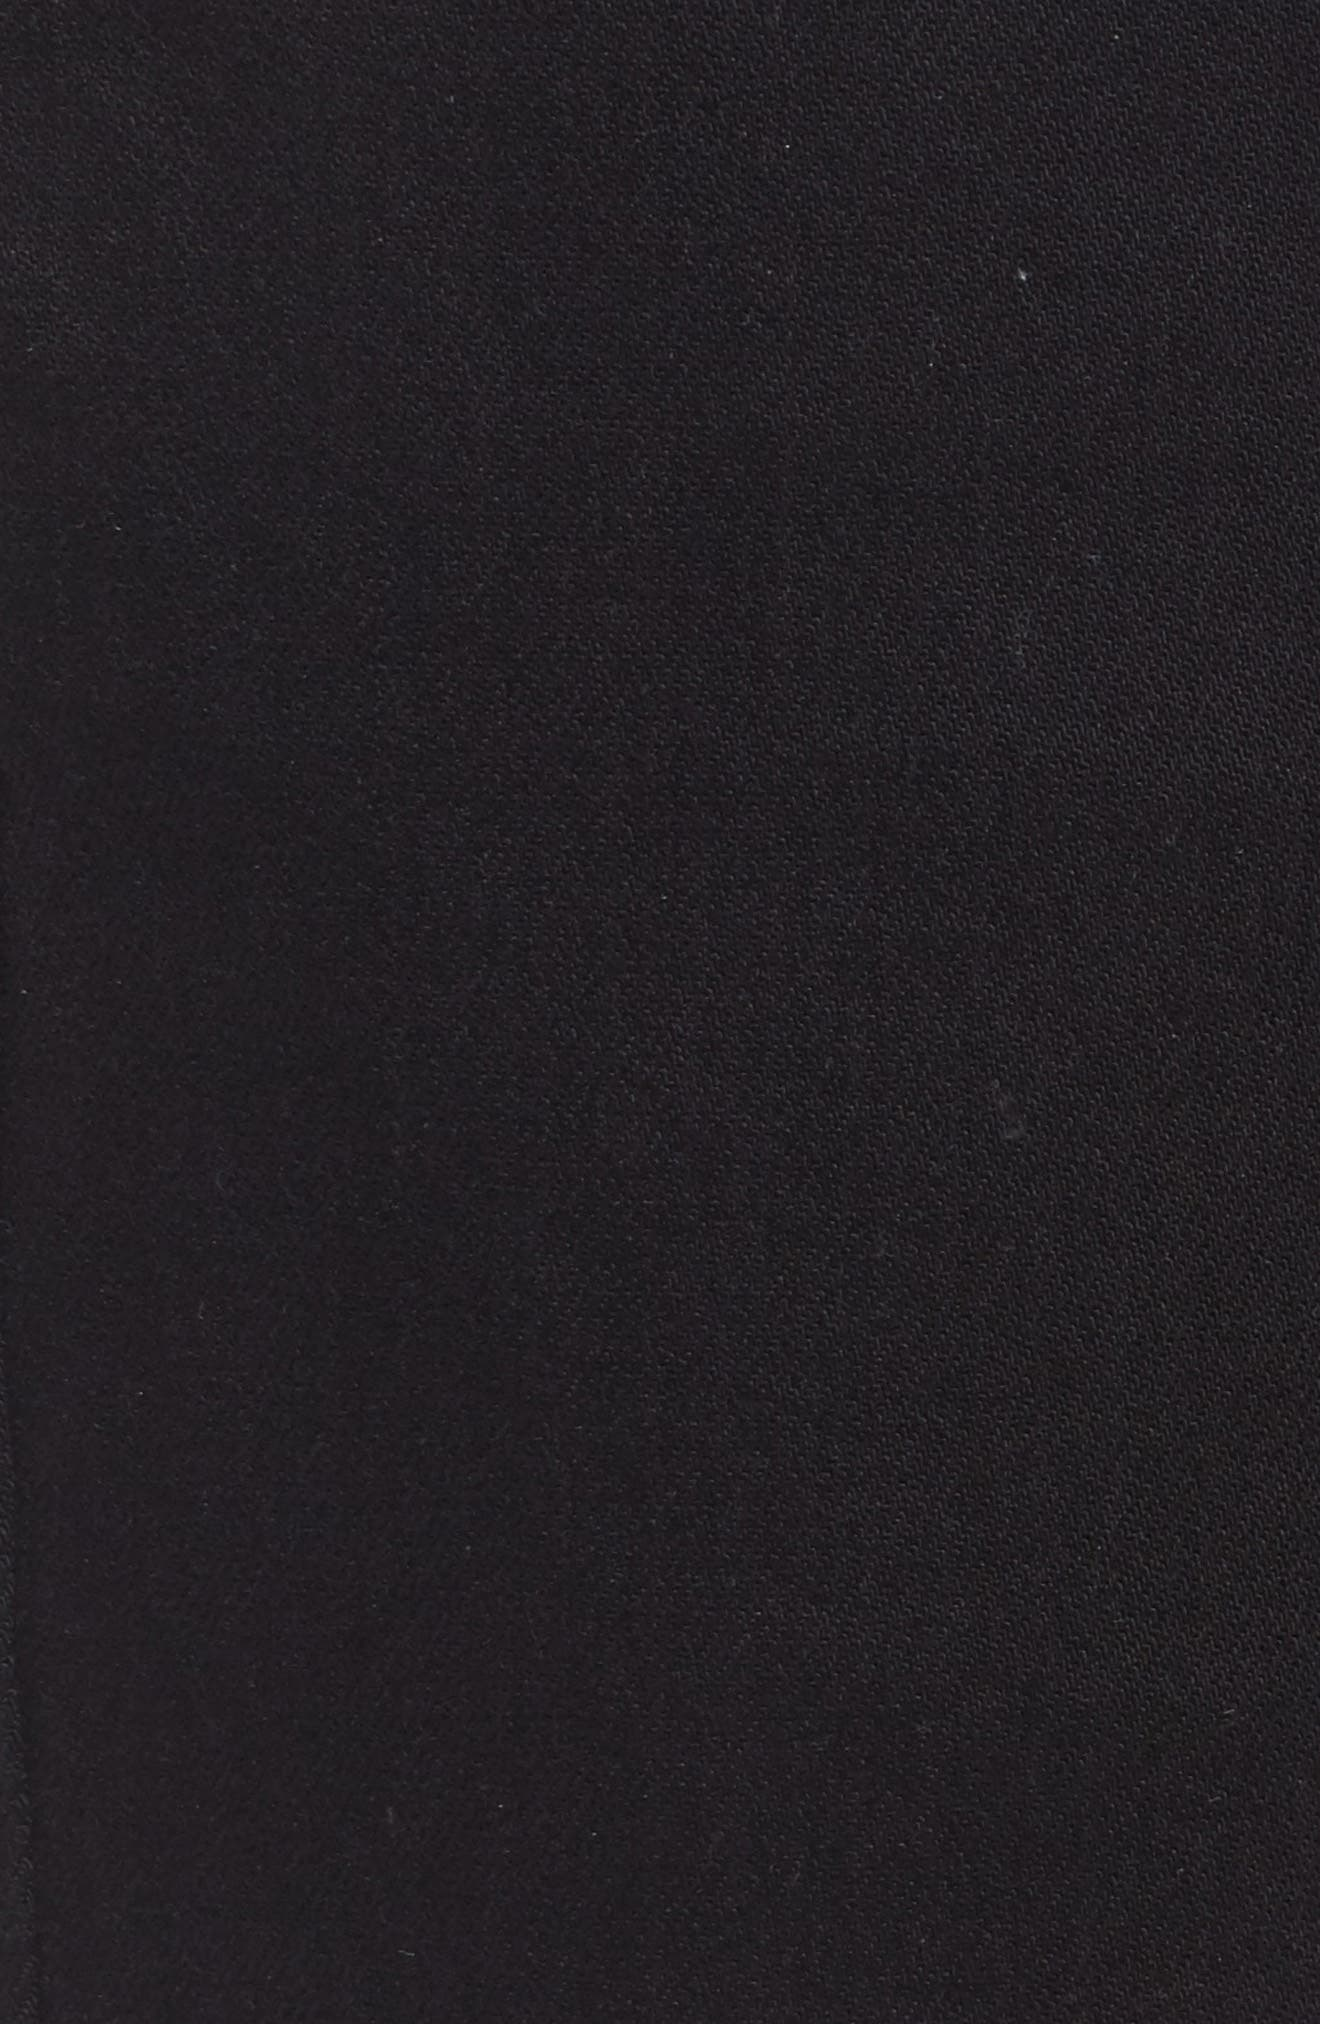 Nick Slim Fit Flat Front Pants,                             Alternate thumbnail 5, color,                             001